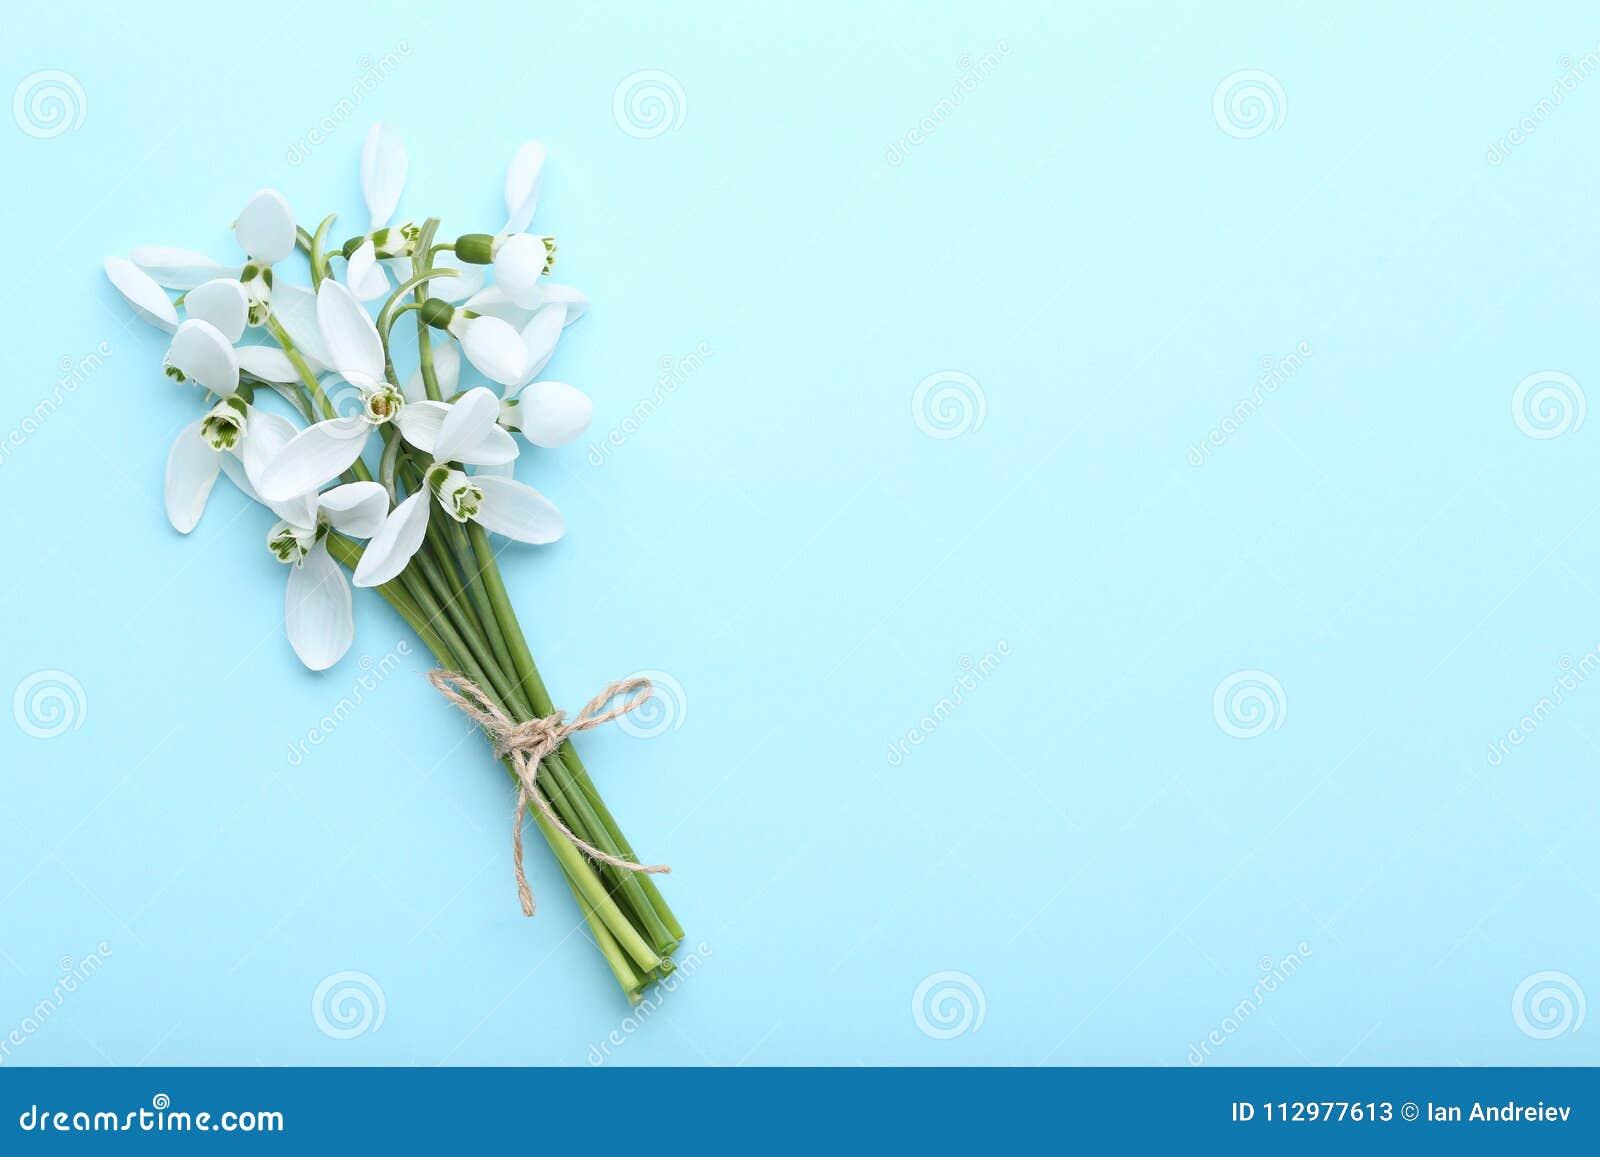 Bouquet of snowdrop flowers